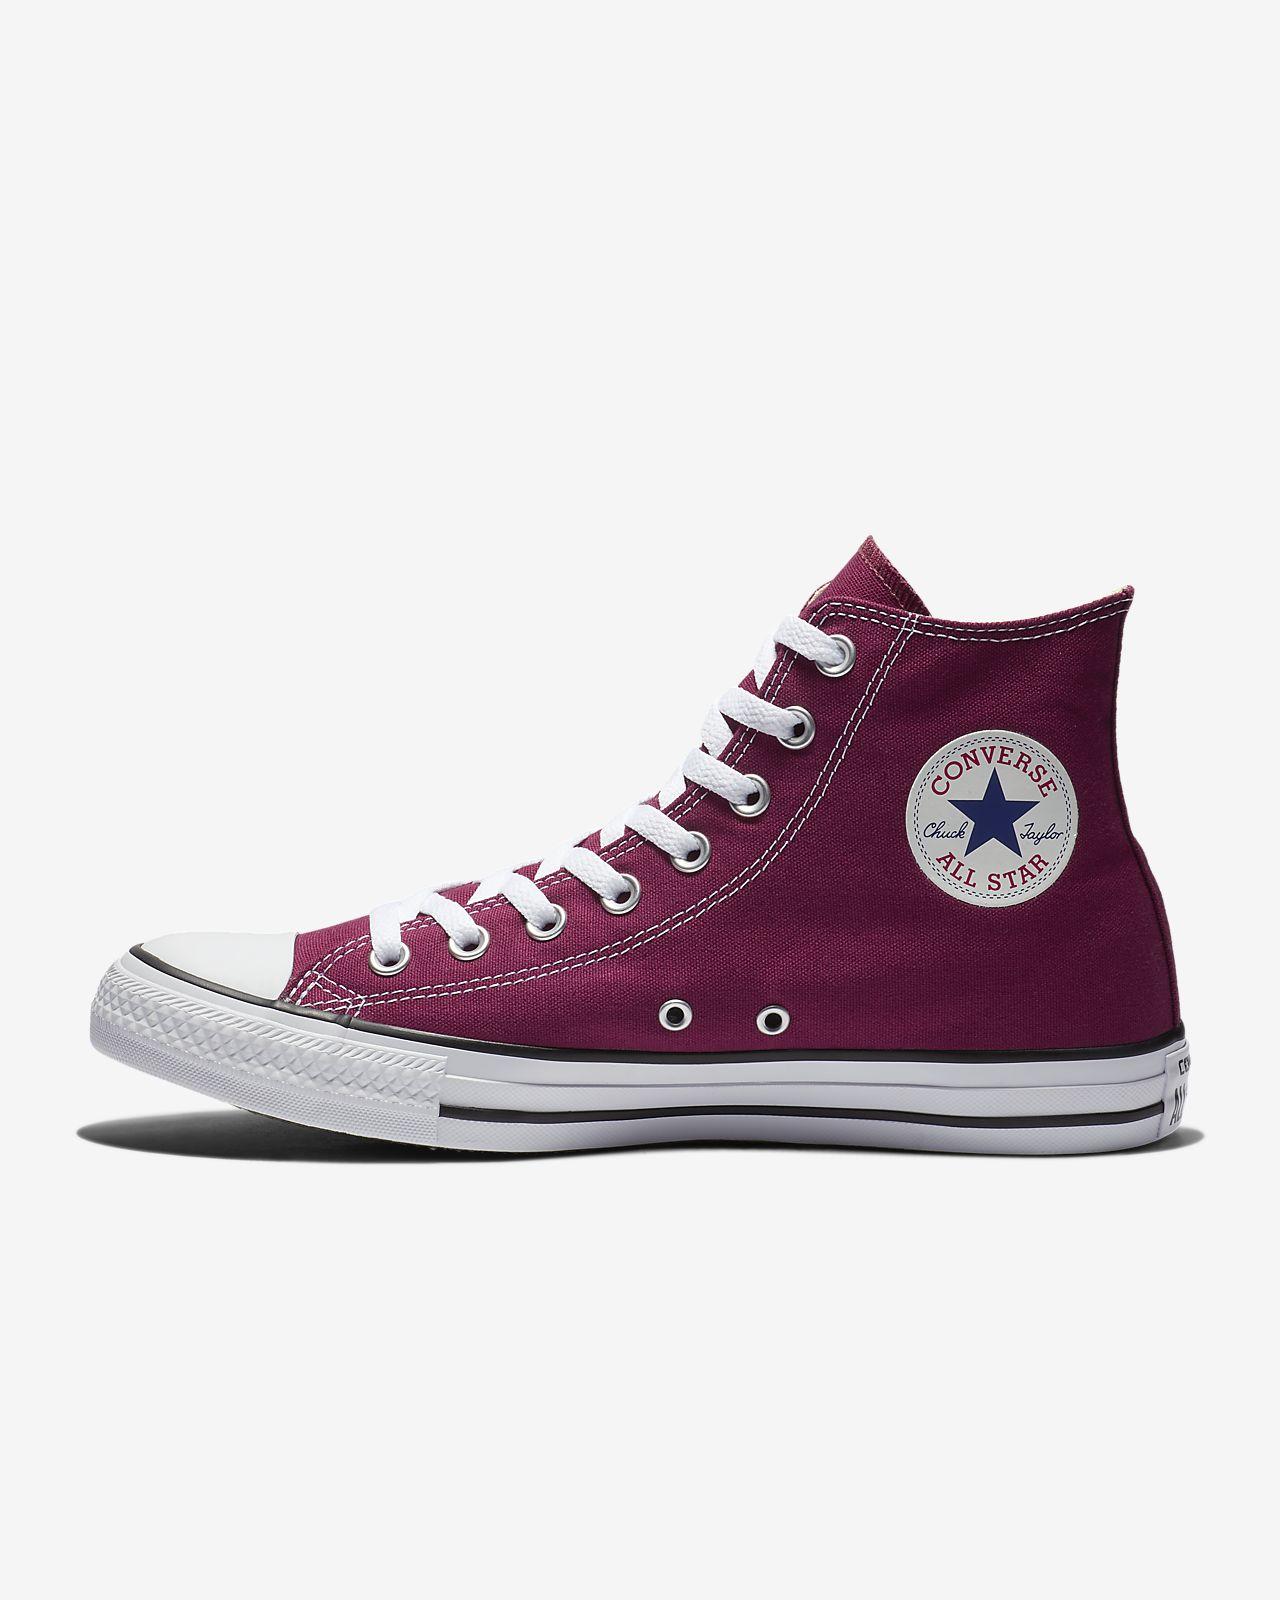 Converse Chuck Taylor All Star Seasonal High Top Unisex Shoe